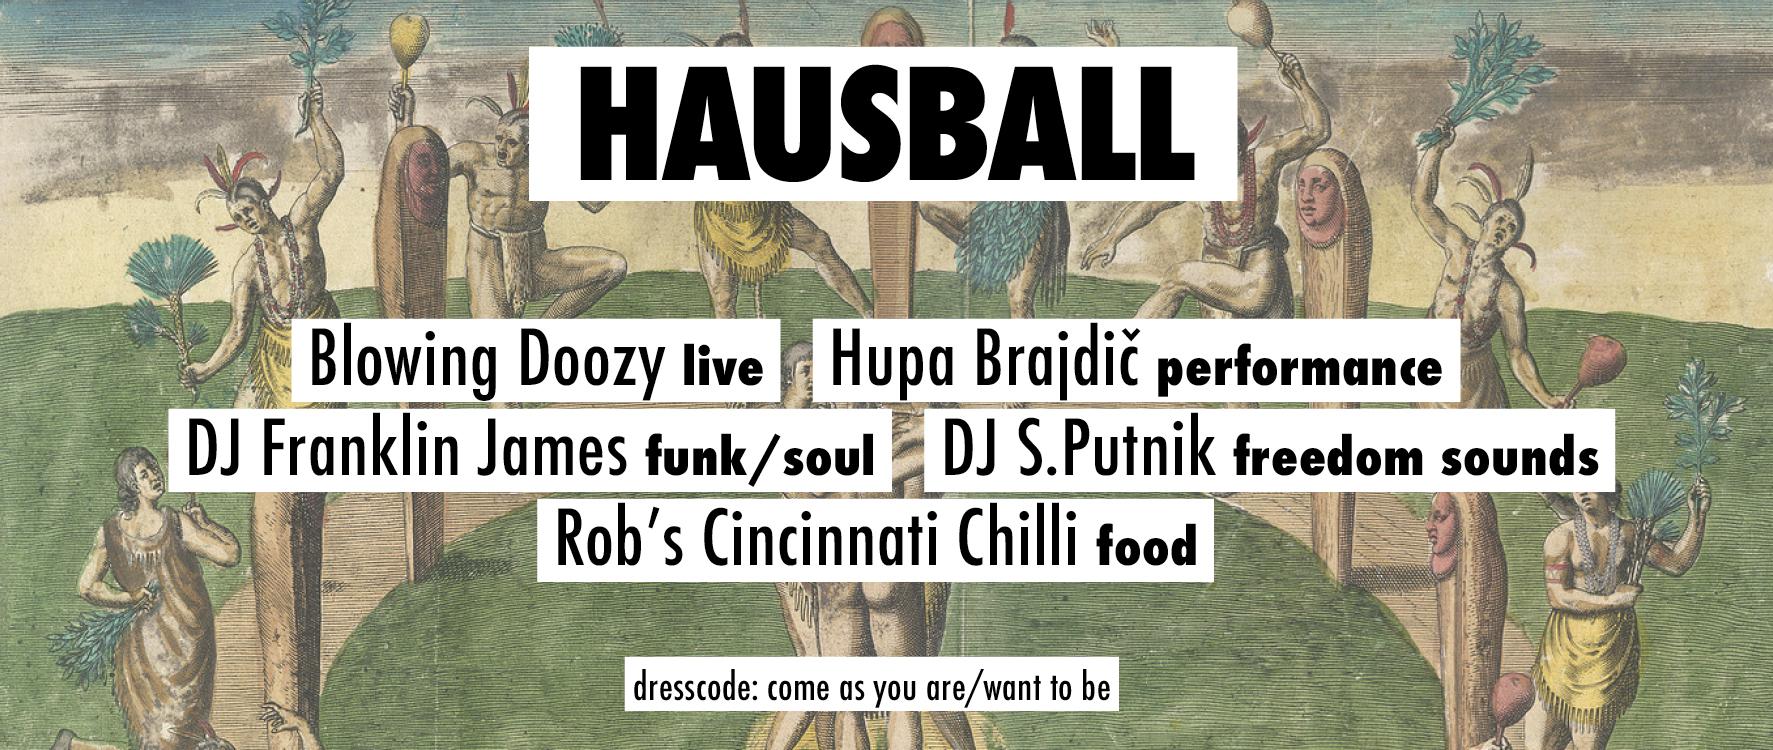 Hausball am 24. February 2020 @ Villa For Forest.